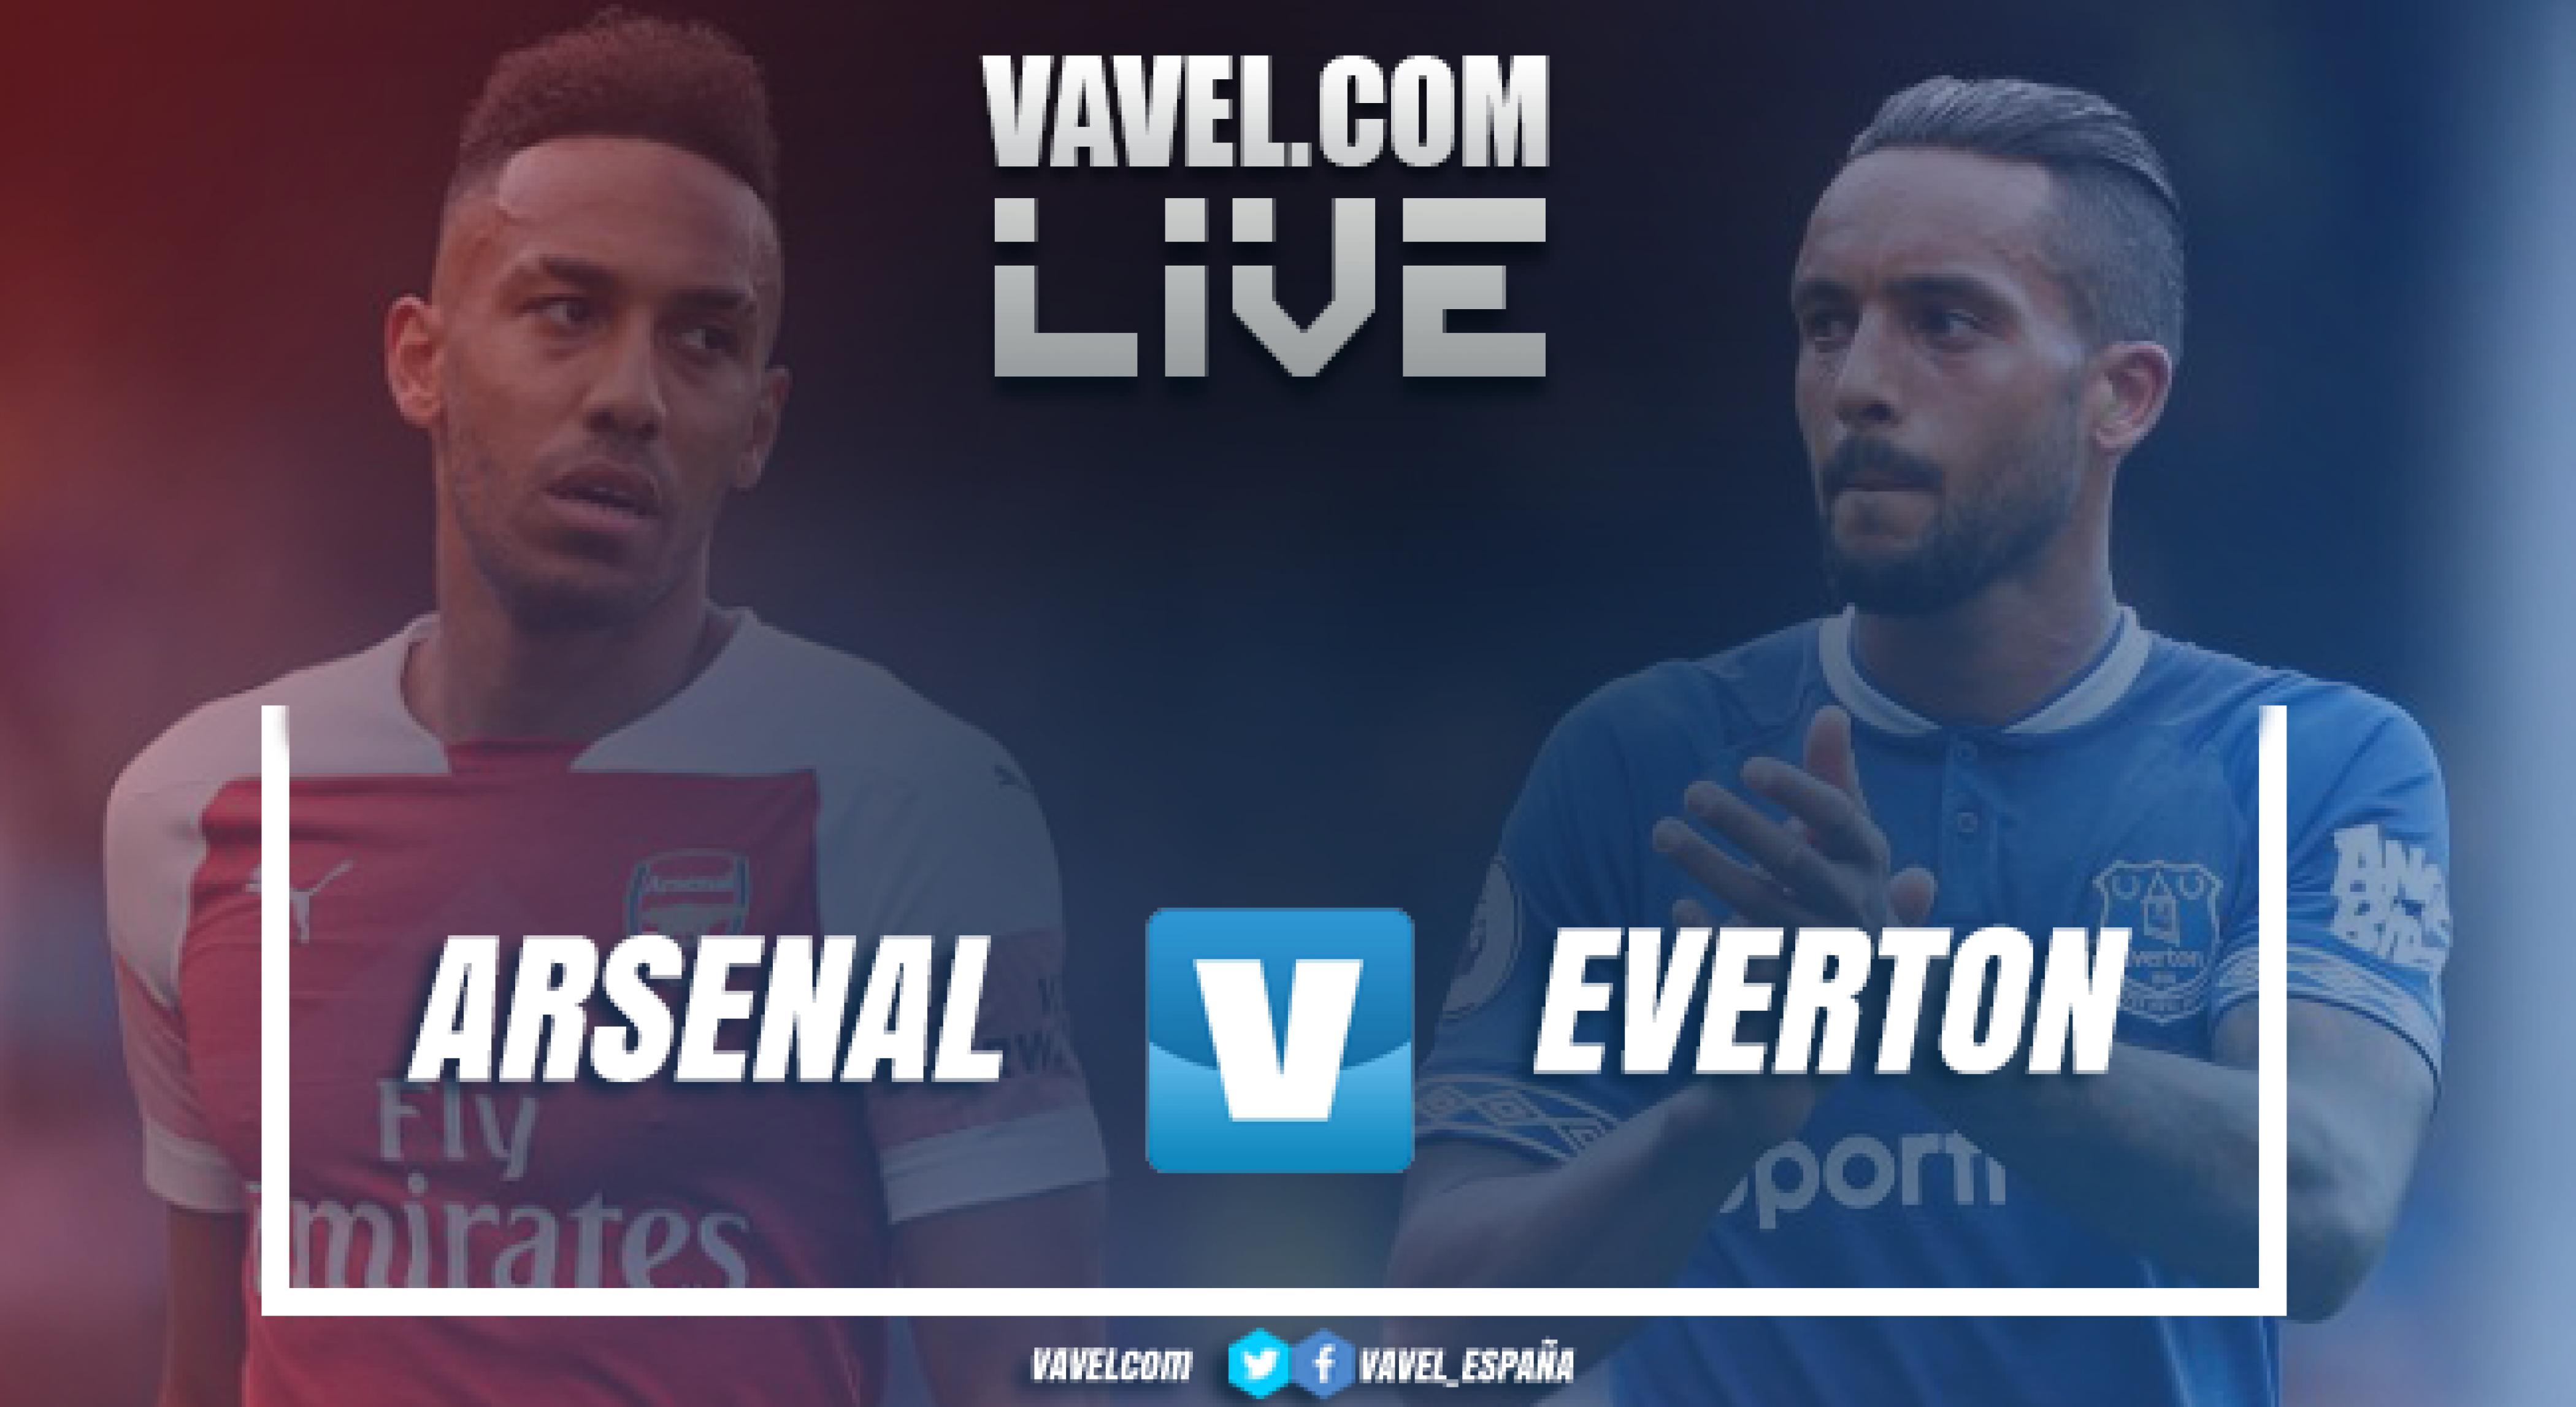 Resumen Arsenal vs Everton en Premier League 2018 (2-0)